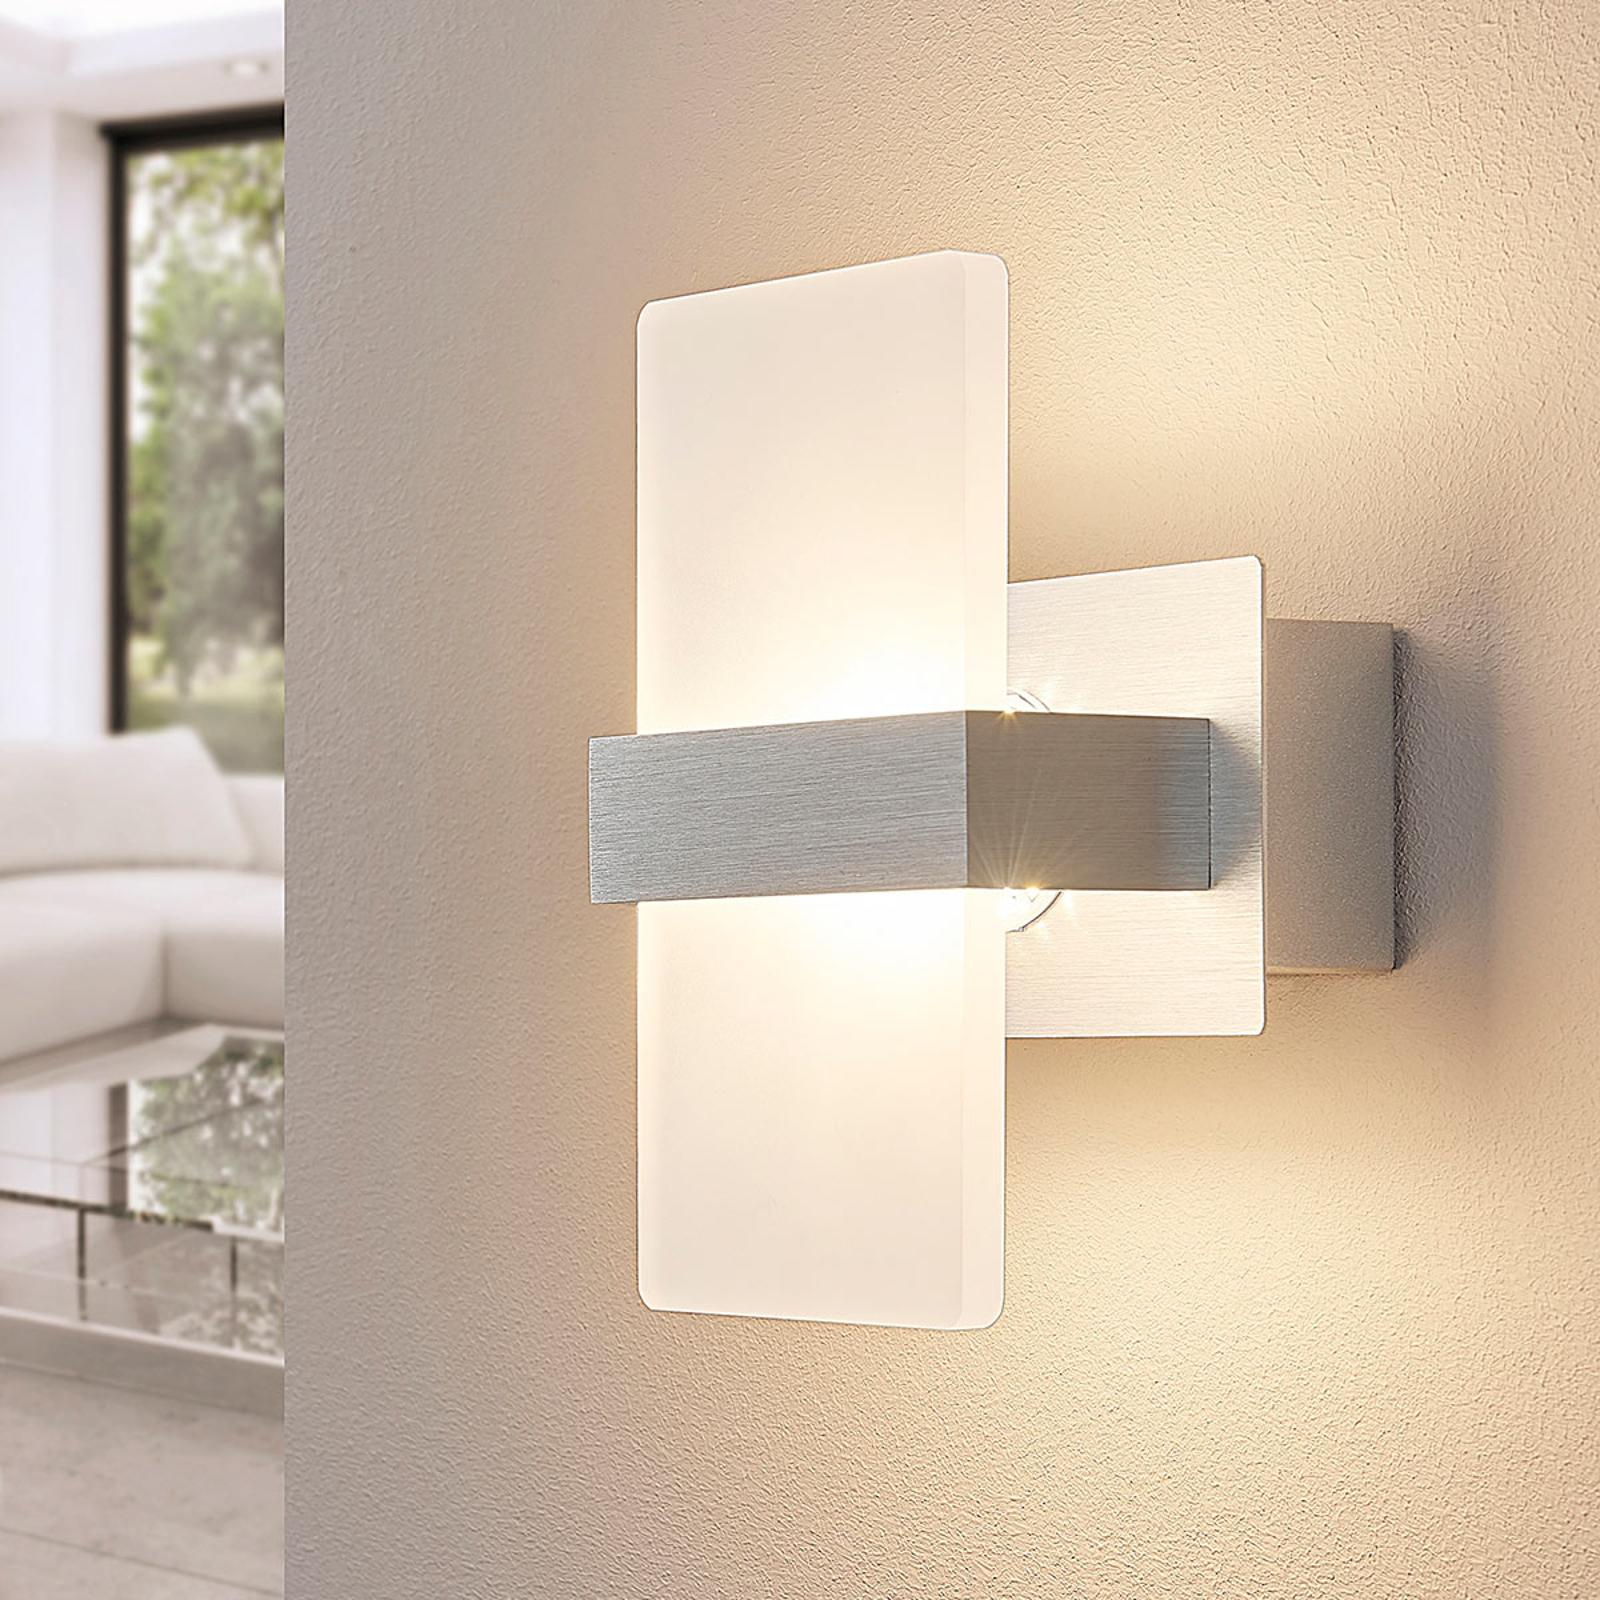 LED wandlamp Yorick met witte kunststof afdekking